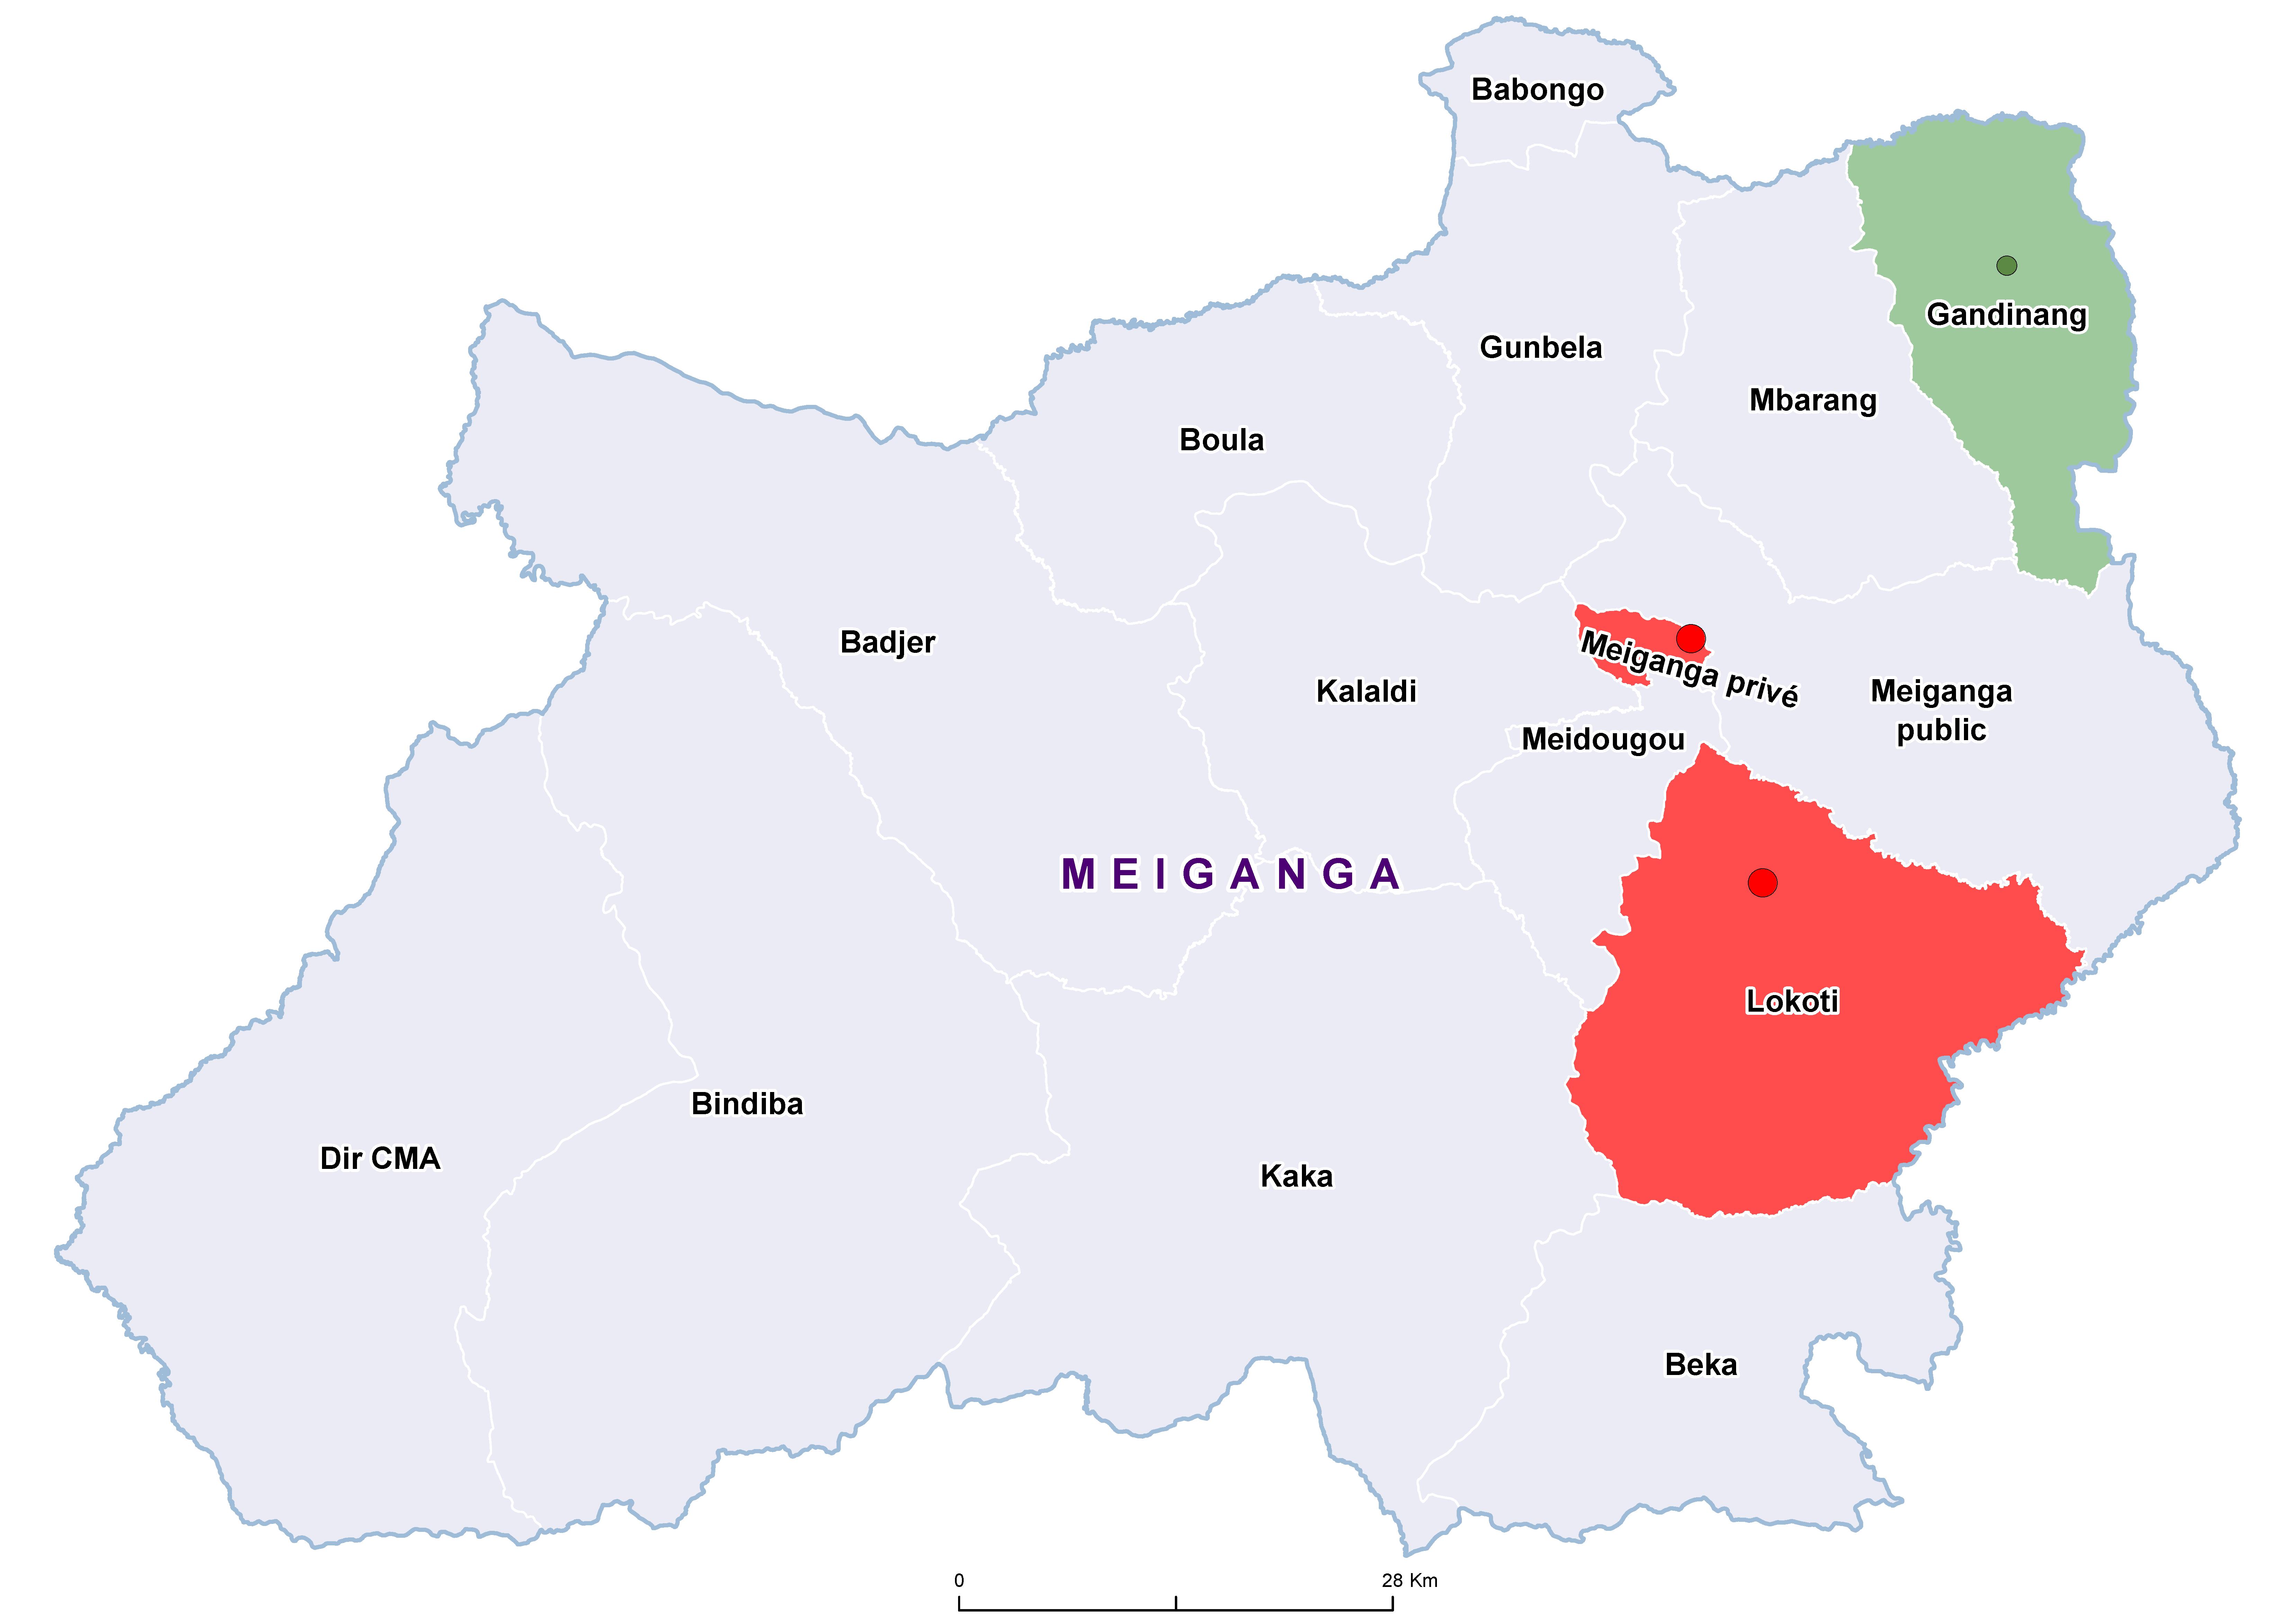 Meiganga SCH 19850001